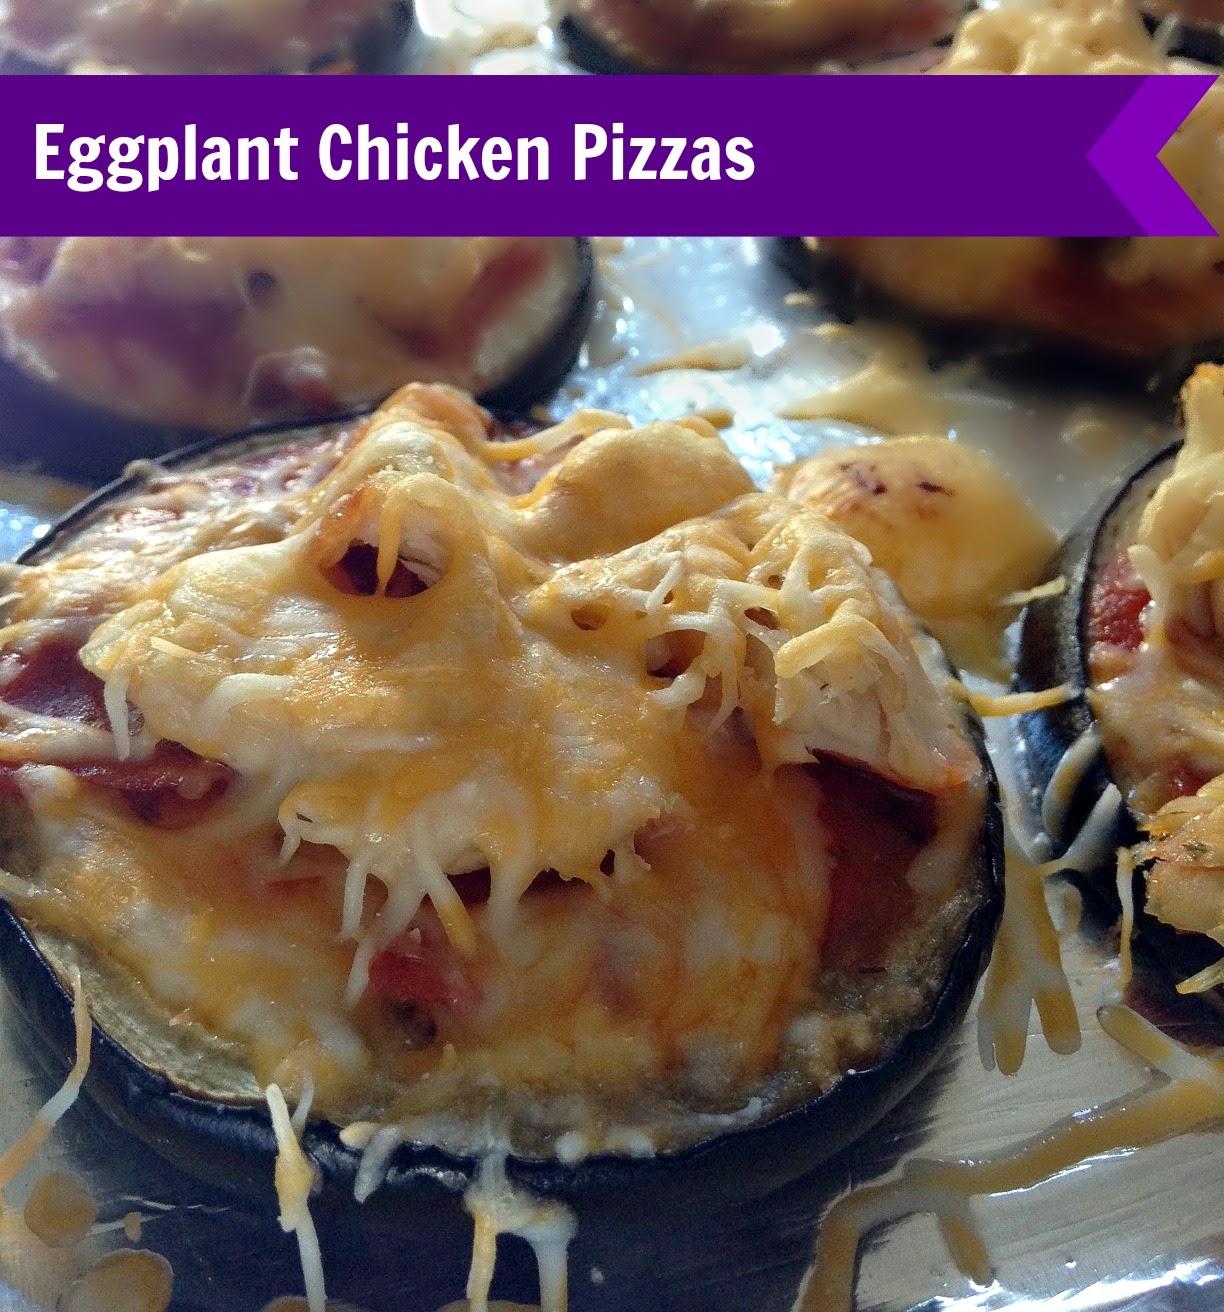 http://www.playpaleo.com/poultry/2014/7/22/mini-eggplant-chicken-pizzas